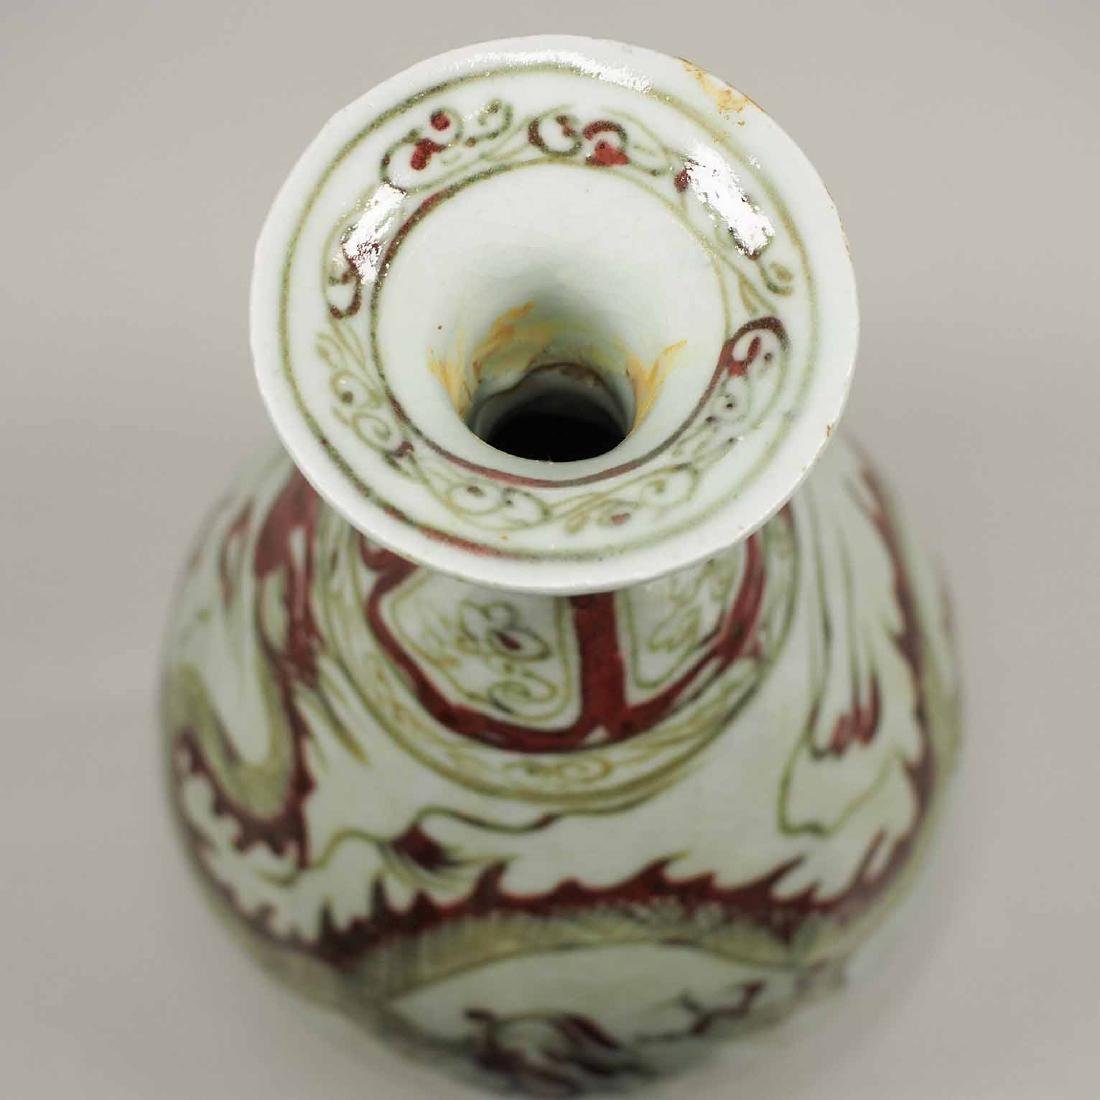 Yuhuchun Vase with Dragon Design, Yuan Dynasty - 6